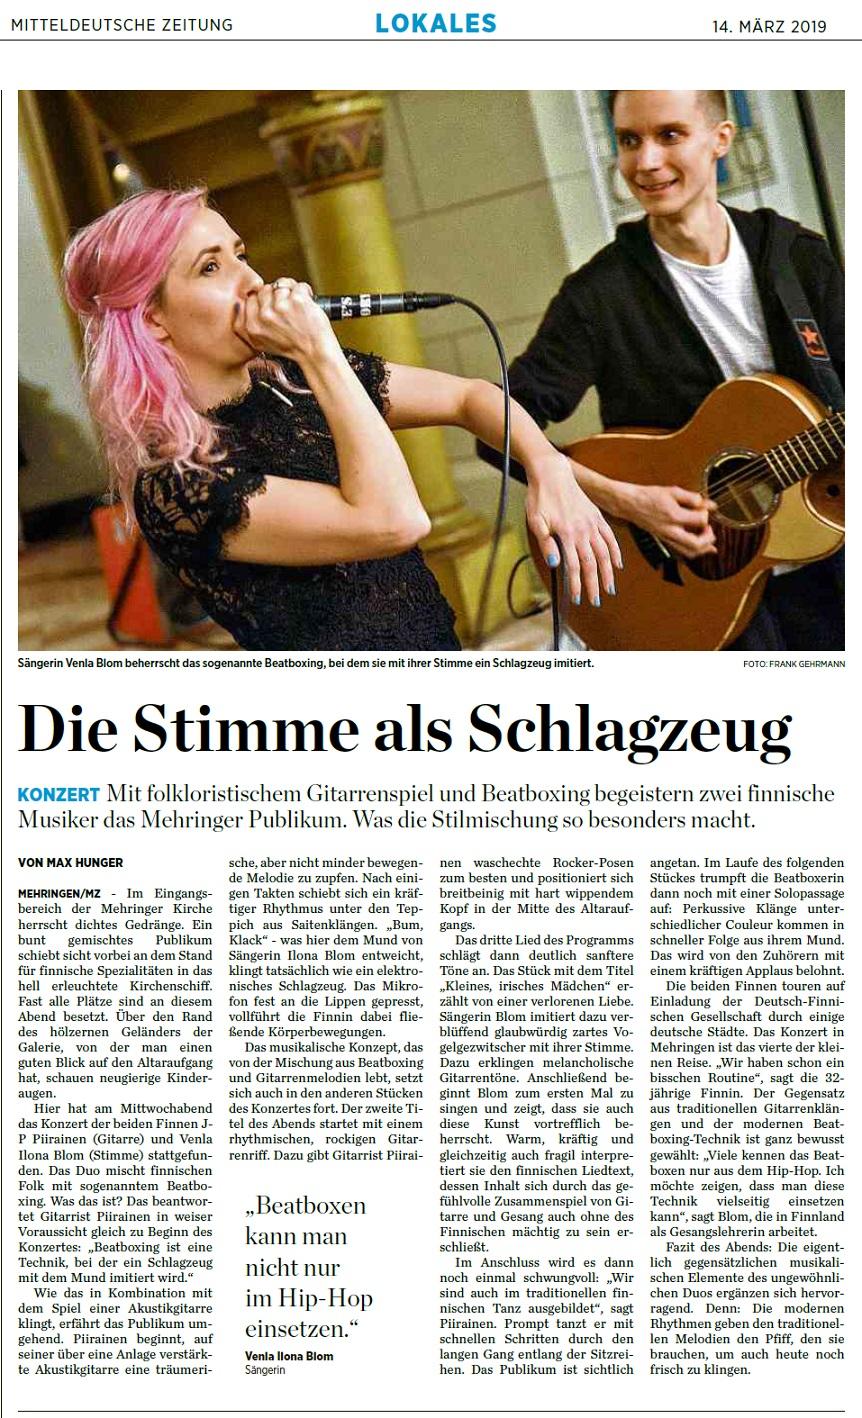 Mitteldeutsche Zeitung (Germany), 14.3.2019